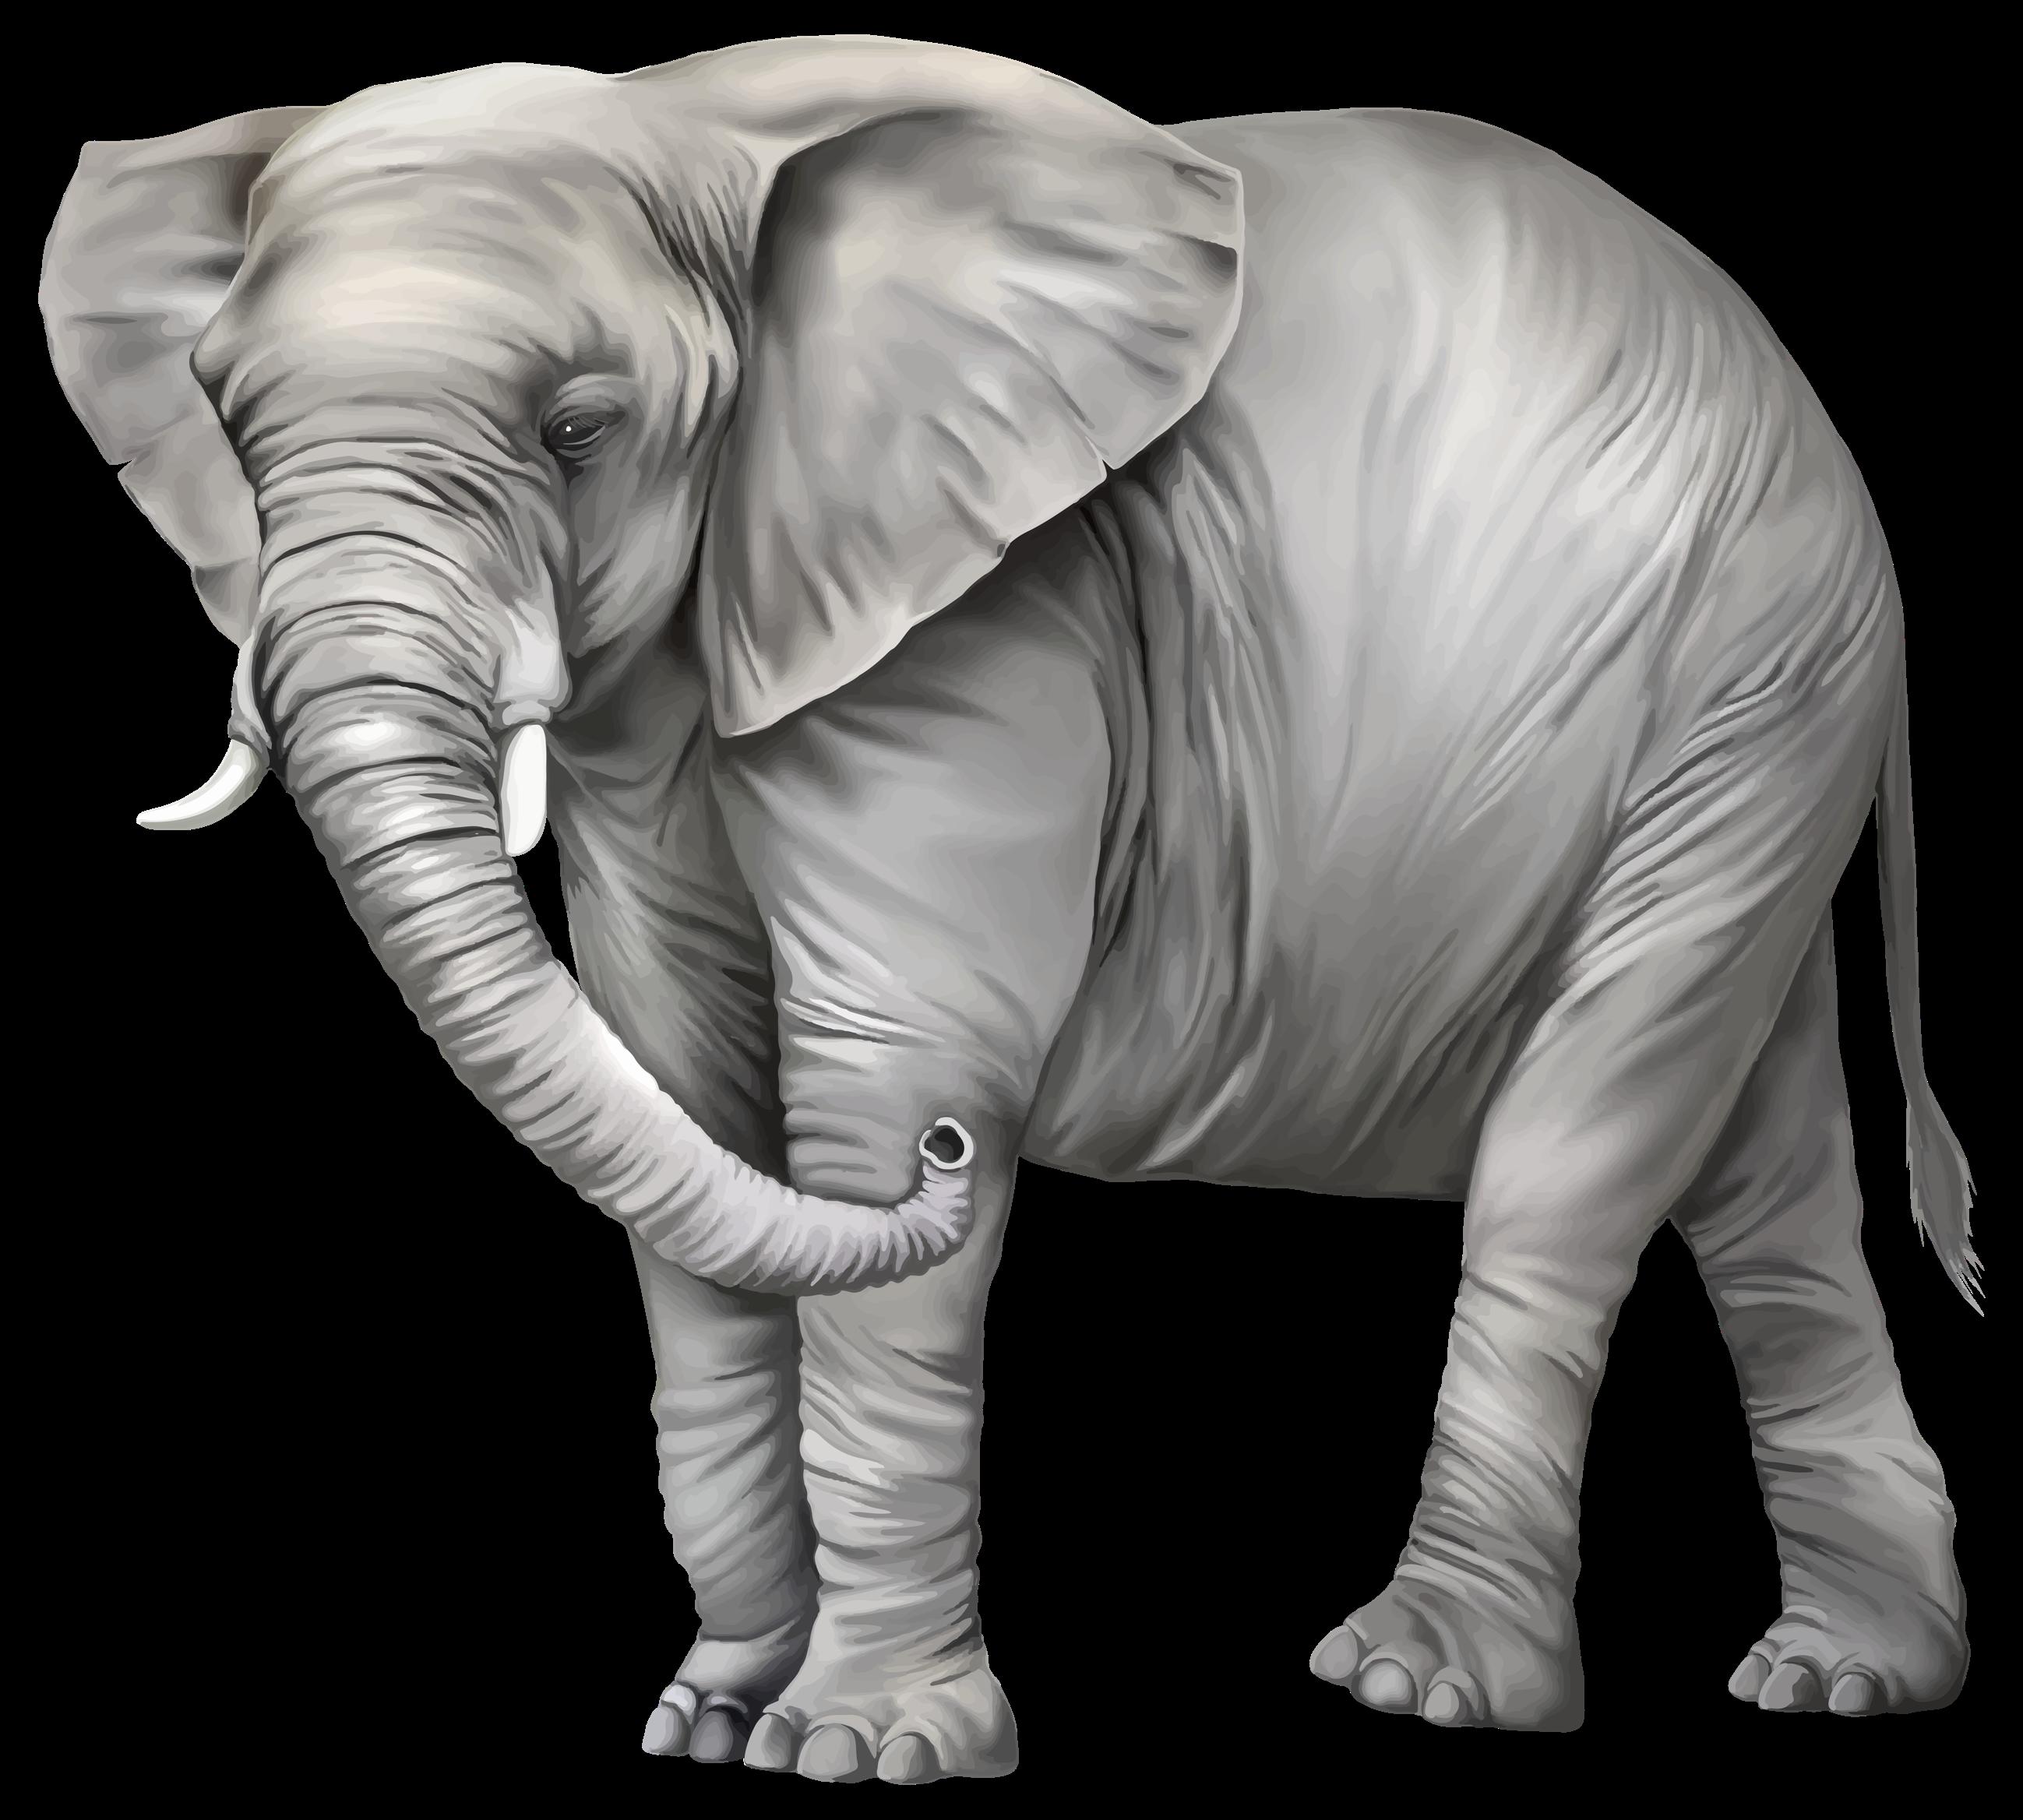 PNG File Name: Elephant PlusPng.com  - Elephant PNG